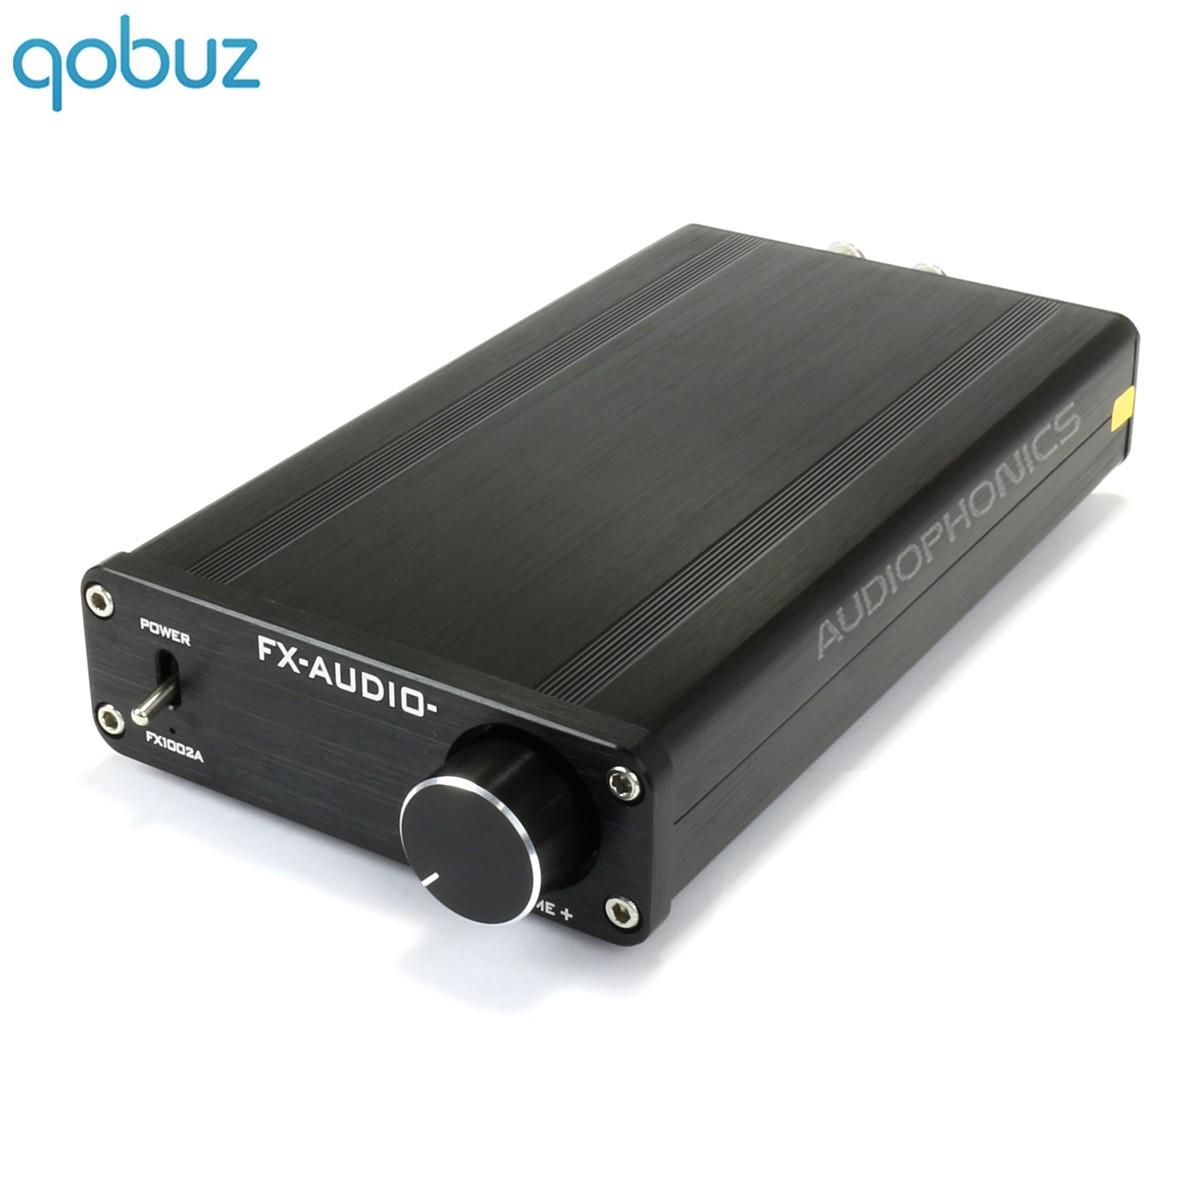 FX-AUDIO FX1002A TDA7498E Class D Amplifier 2x100W / 4 Ohm Black